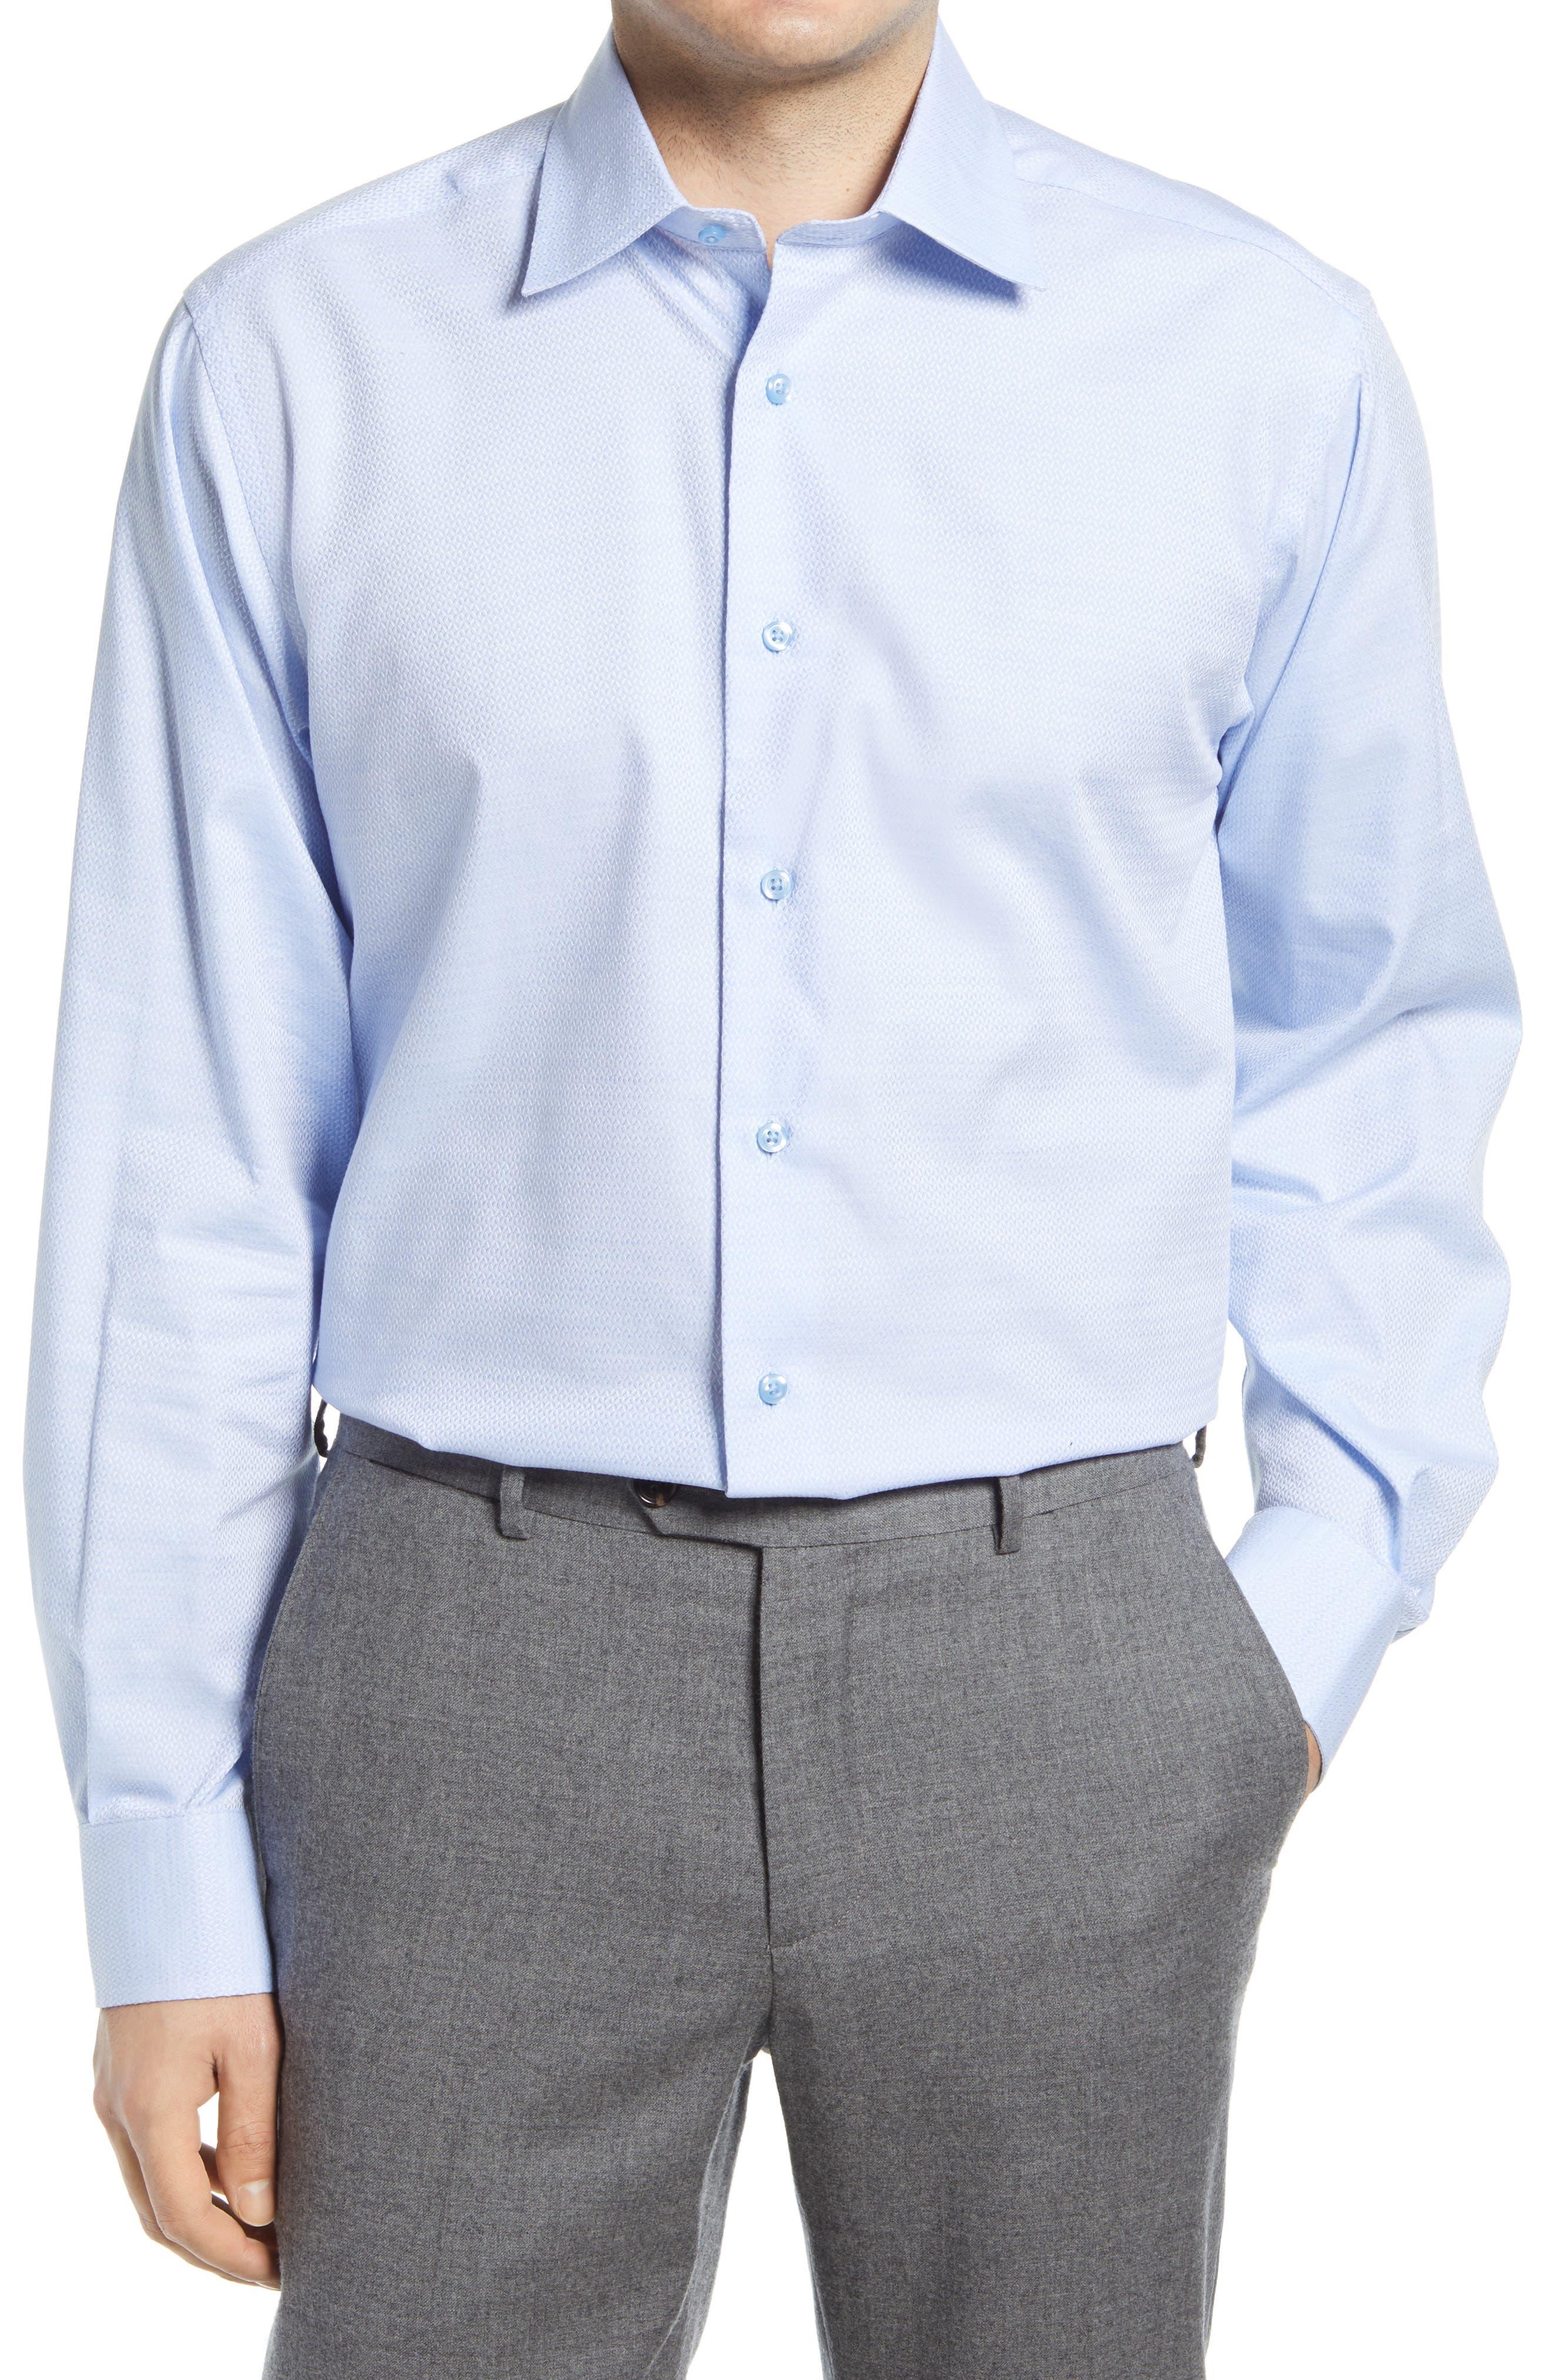 Regular Fit Diamond Dobby Dress Shirt